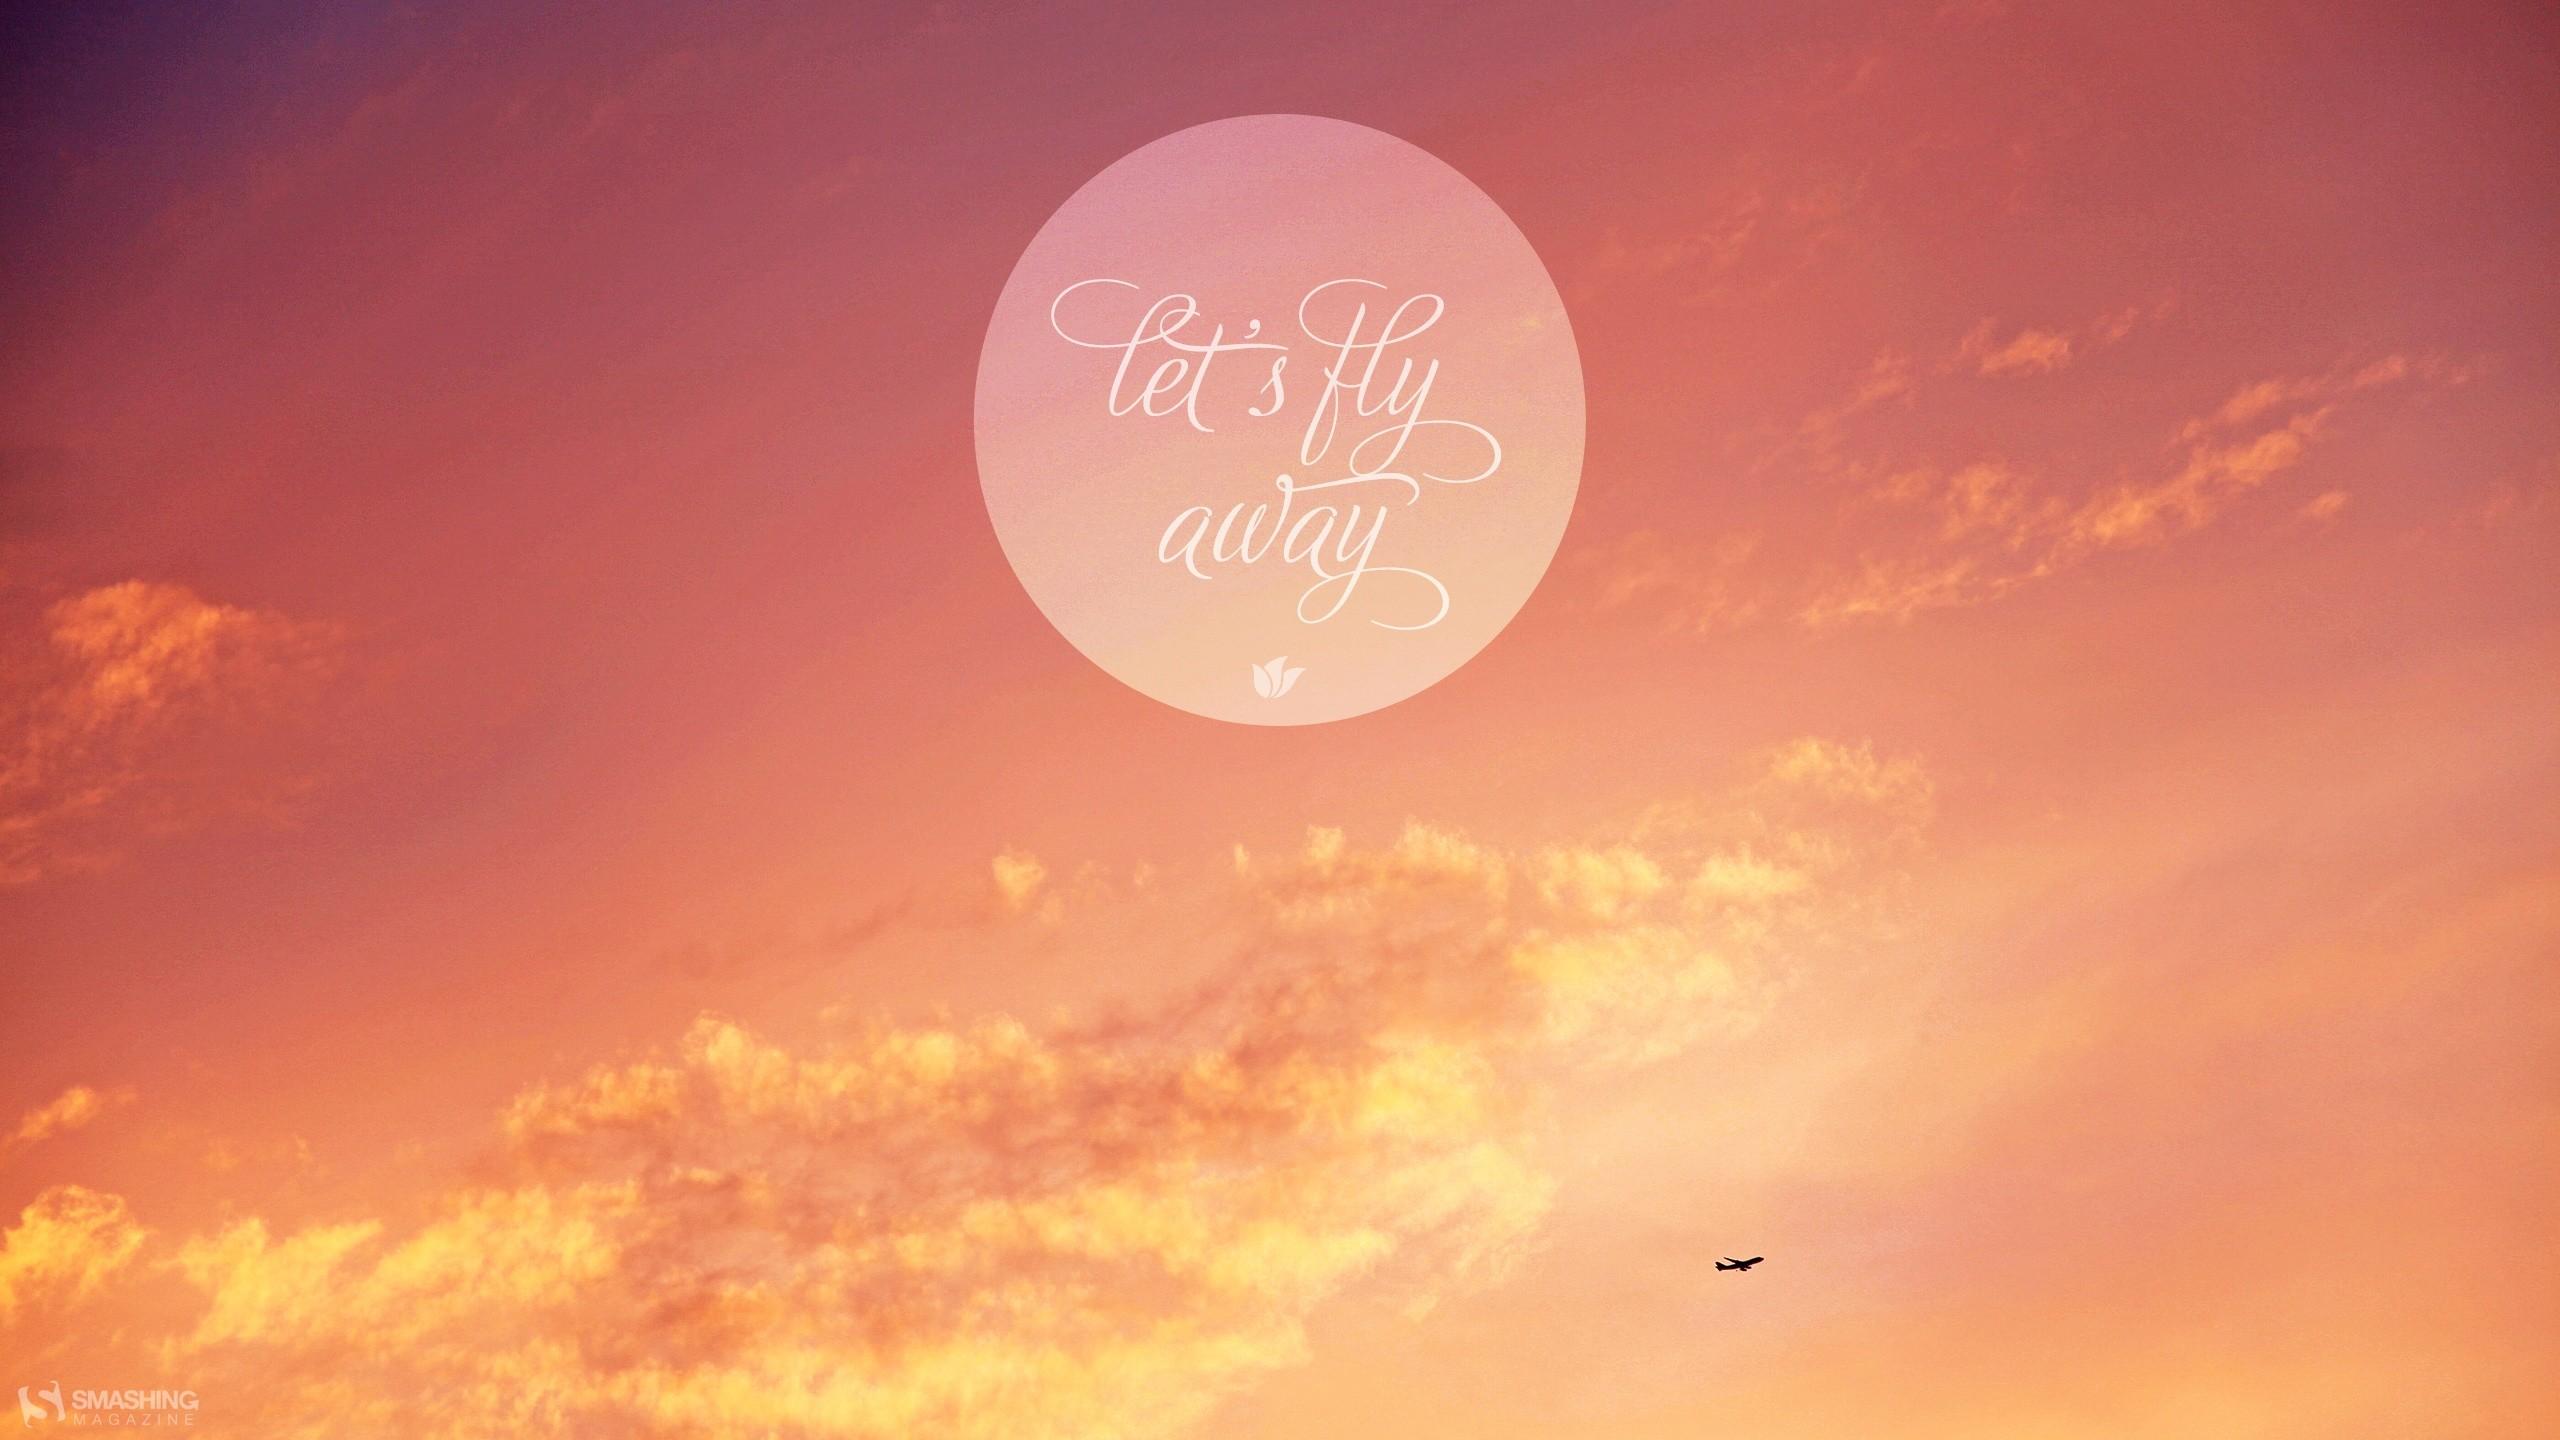 august-12-fly__13-nocal-2560×1440.jpg 2,560×1,440 pixels | Desktop Wallpaper  | Pinterest | Save screen and Wallpaper